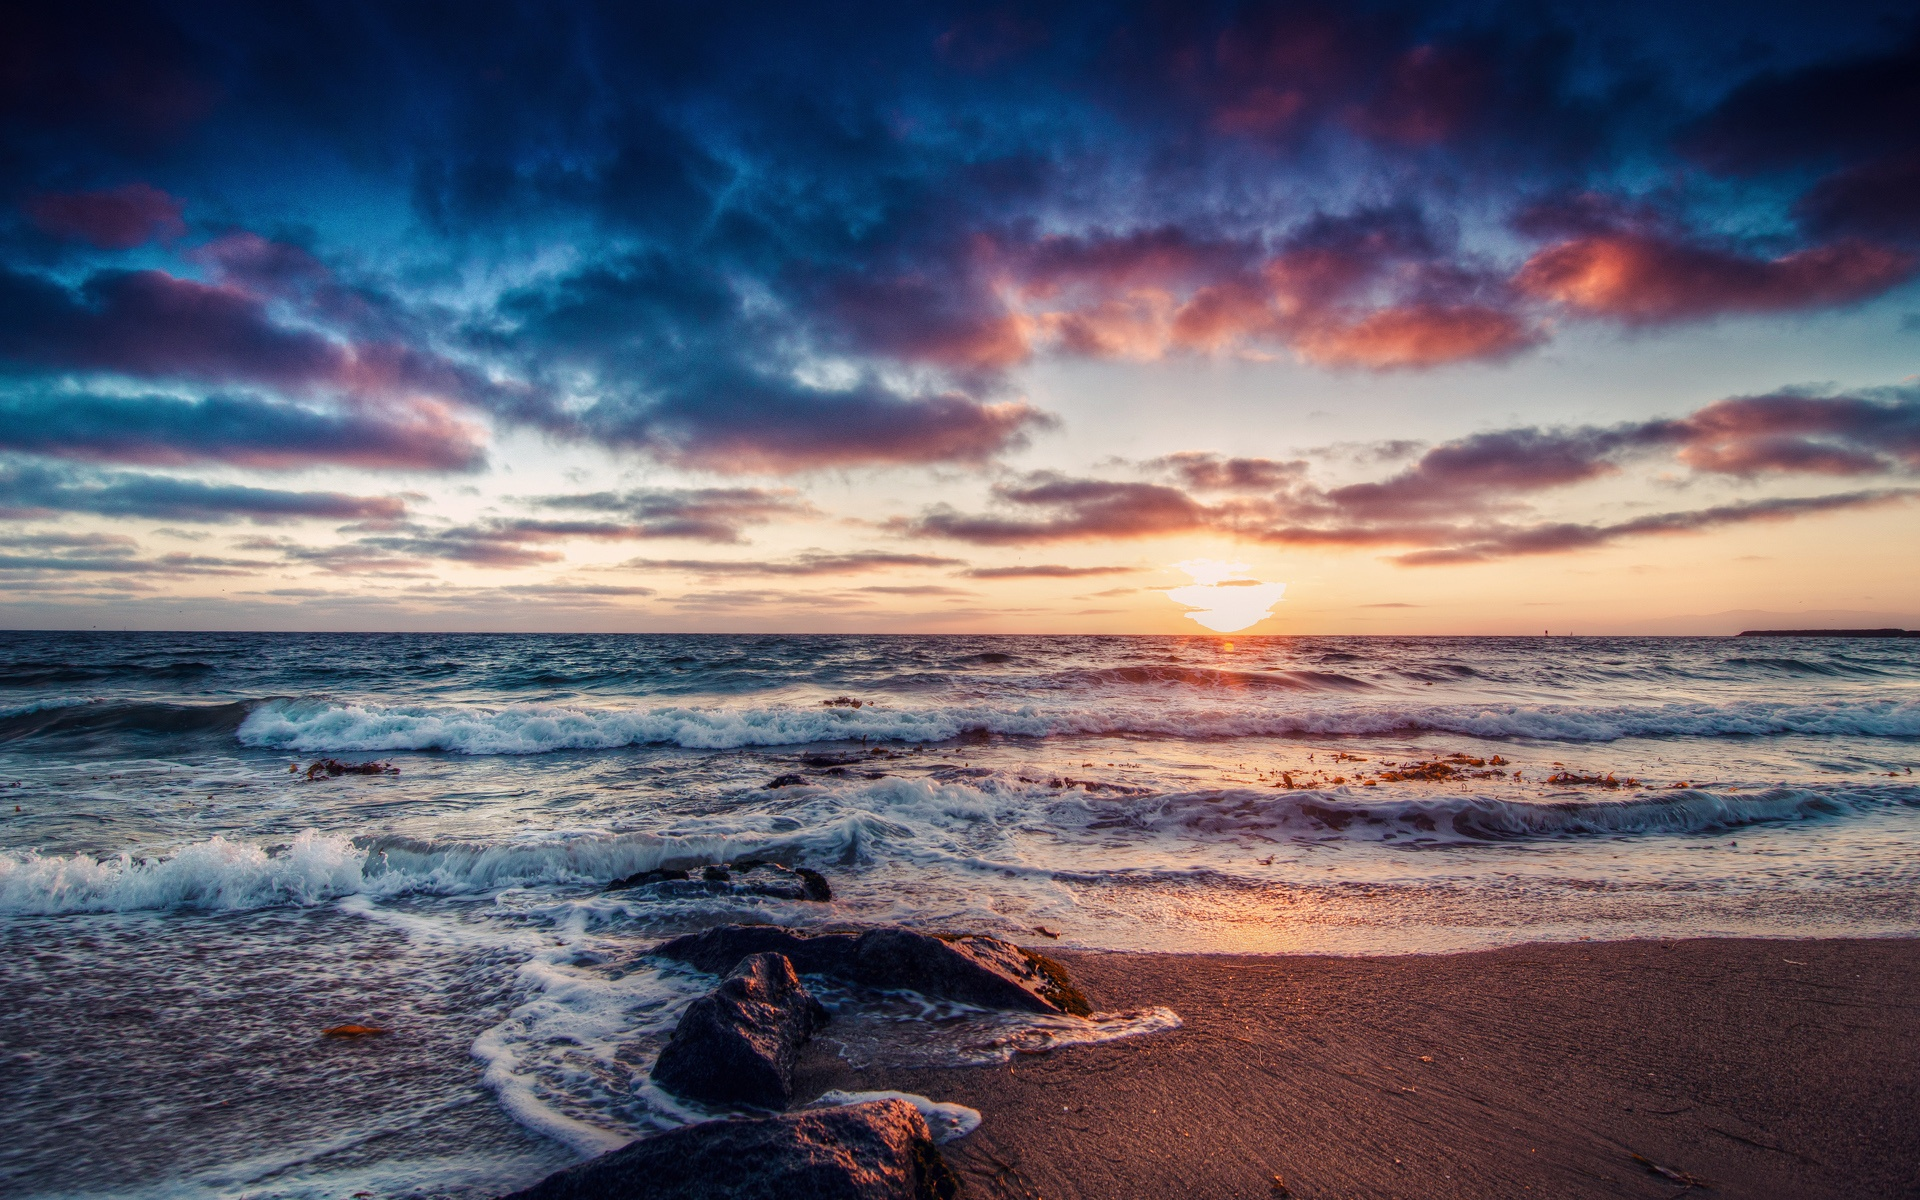 берег волны море  № 251062 бесплатно